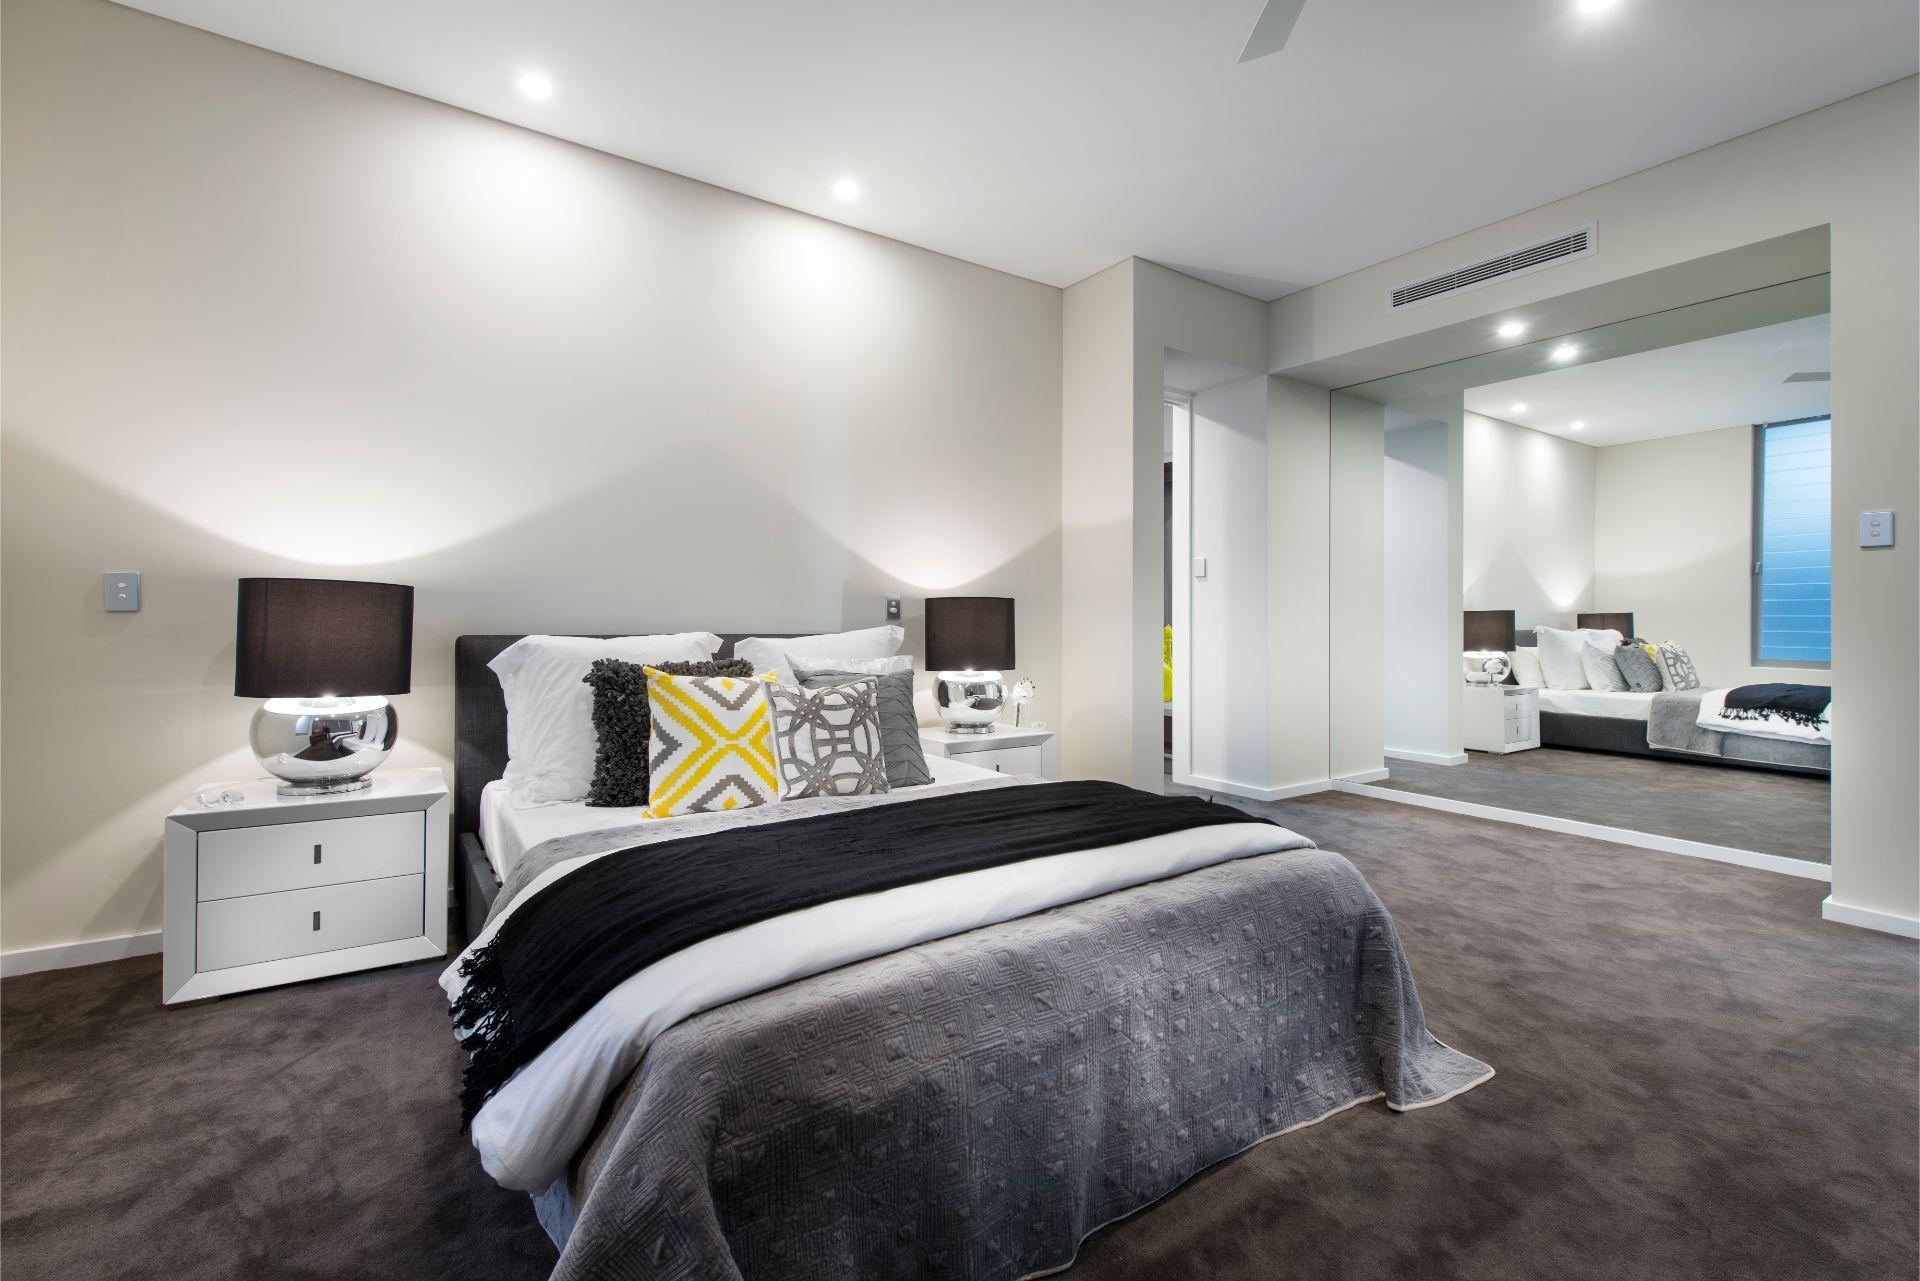 The george-residence-luxury-perth-home.jpg